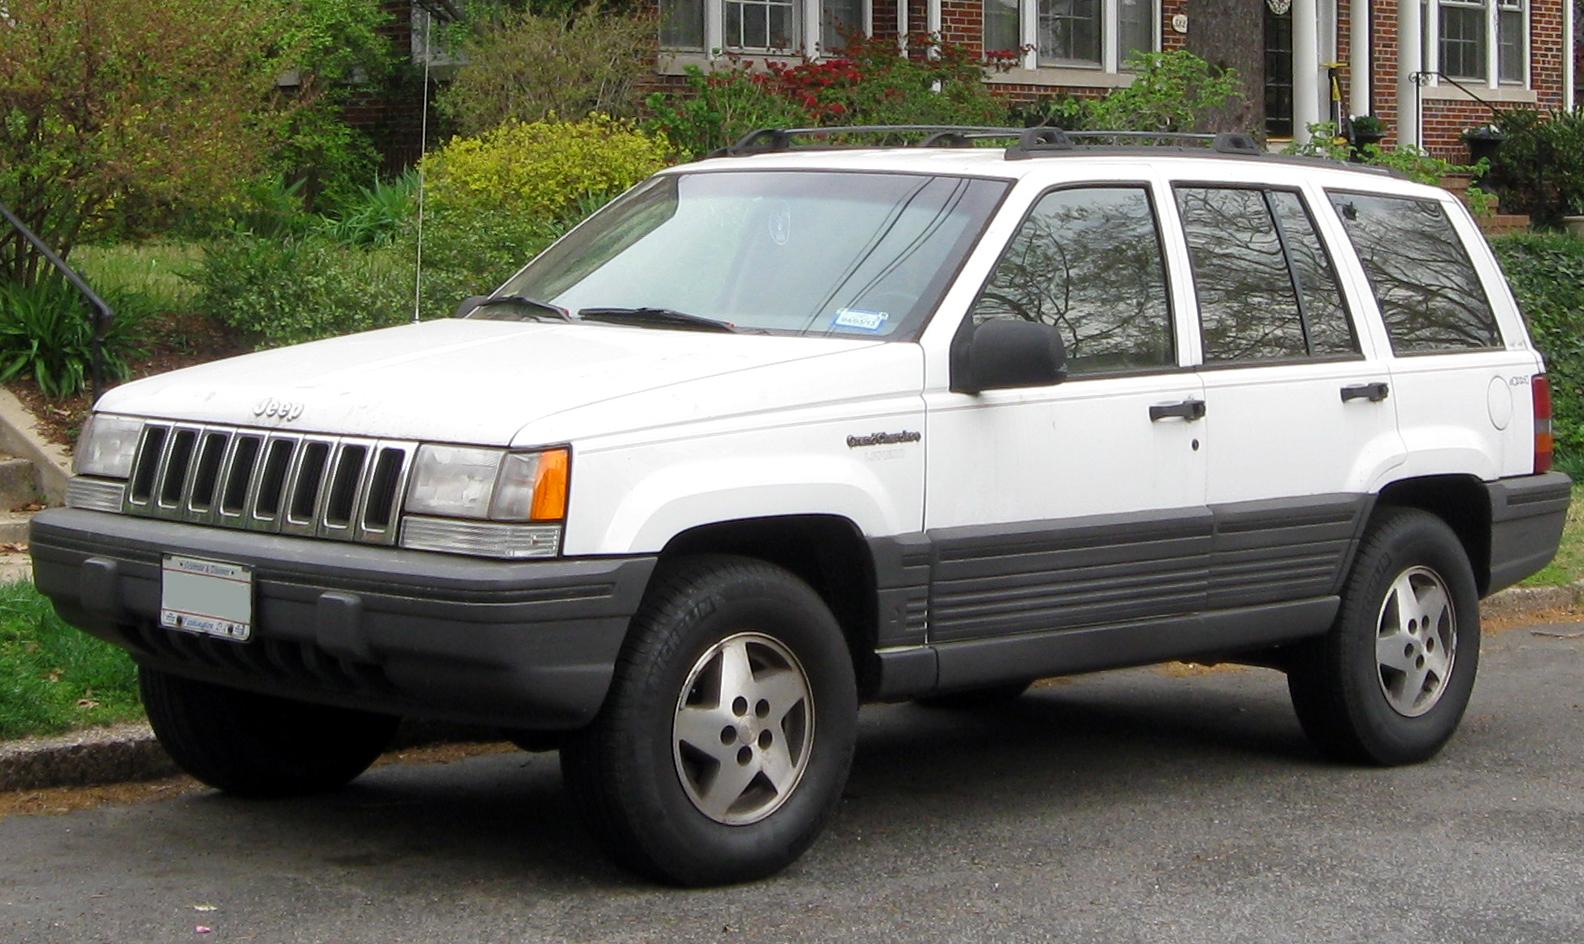 1995 jeep grand cherokee stereo wiring diagram wirdig sensor jeep grand cherokee egr valve location jeep grand cherokee fuel